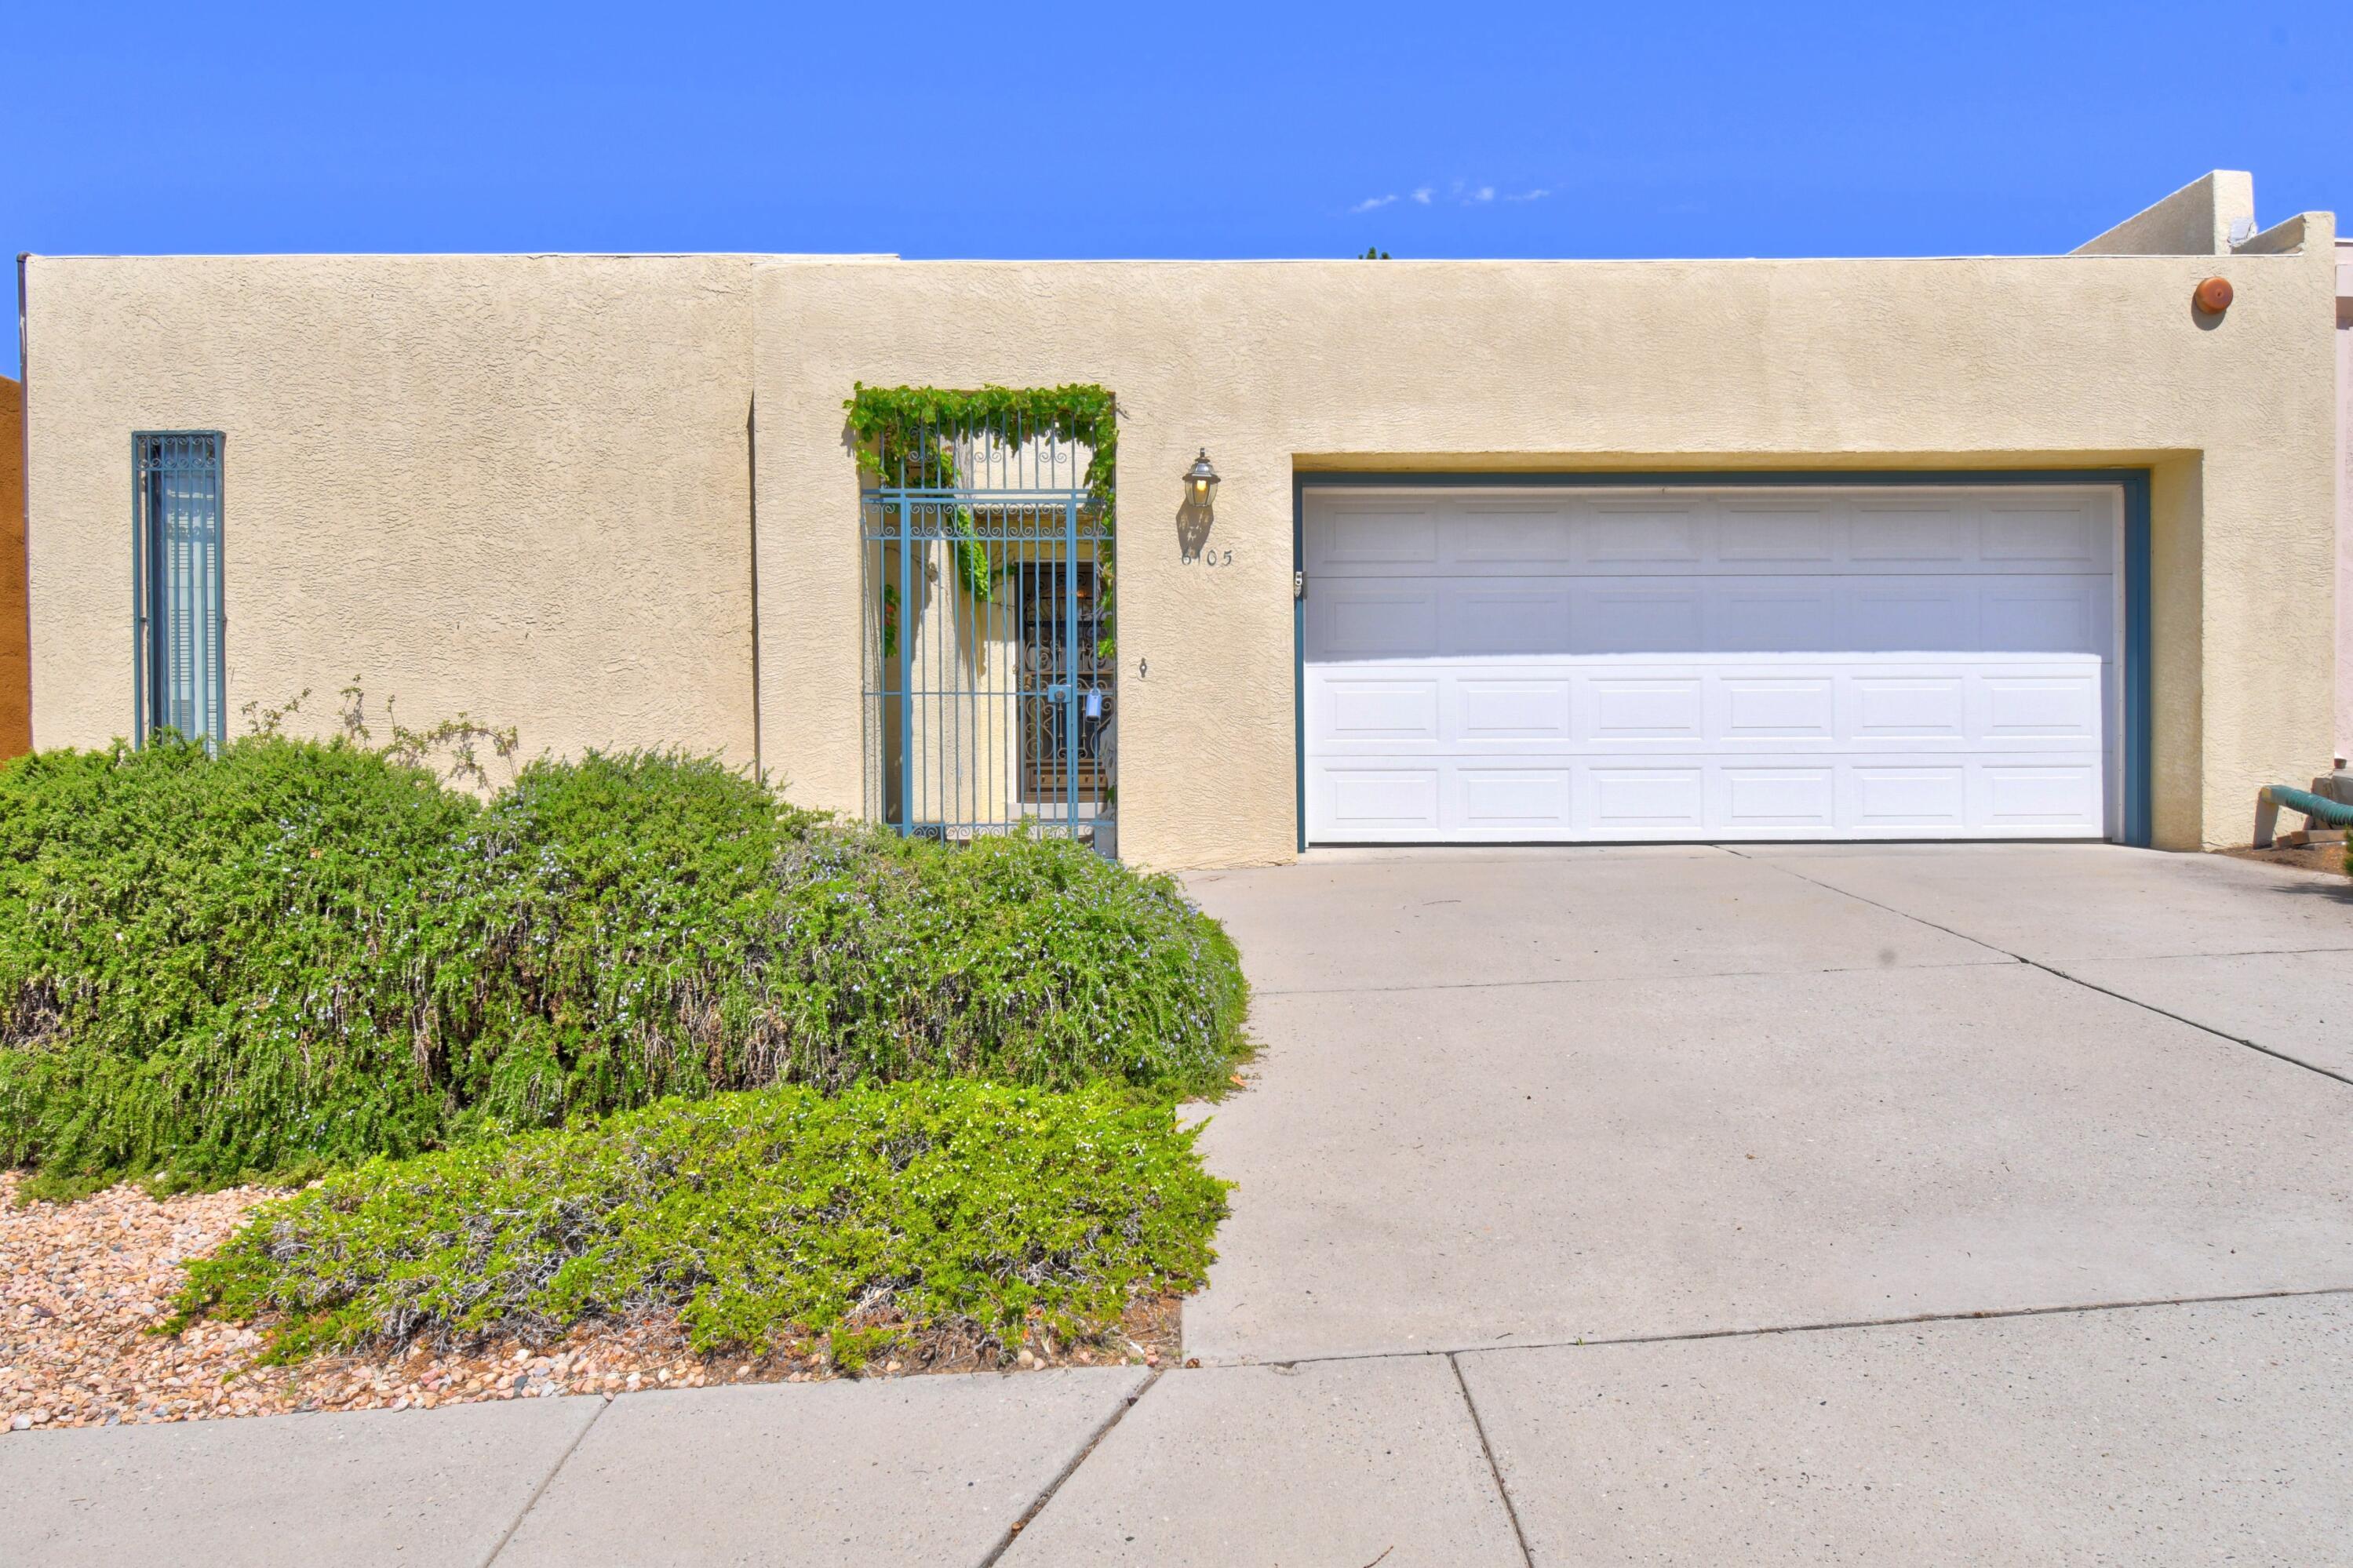 6105 RIO HONDO Drive, Albuquerque NM 87109